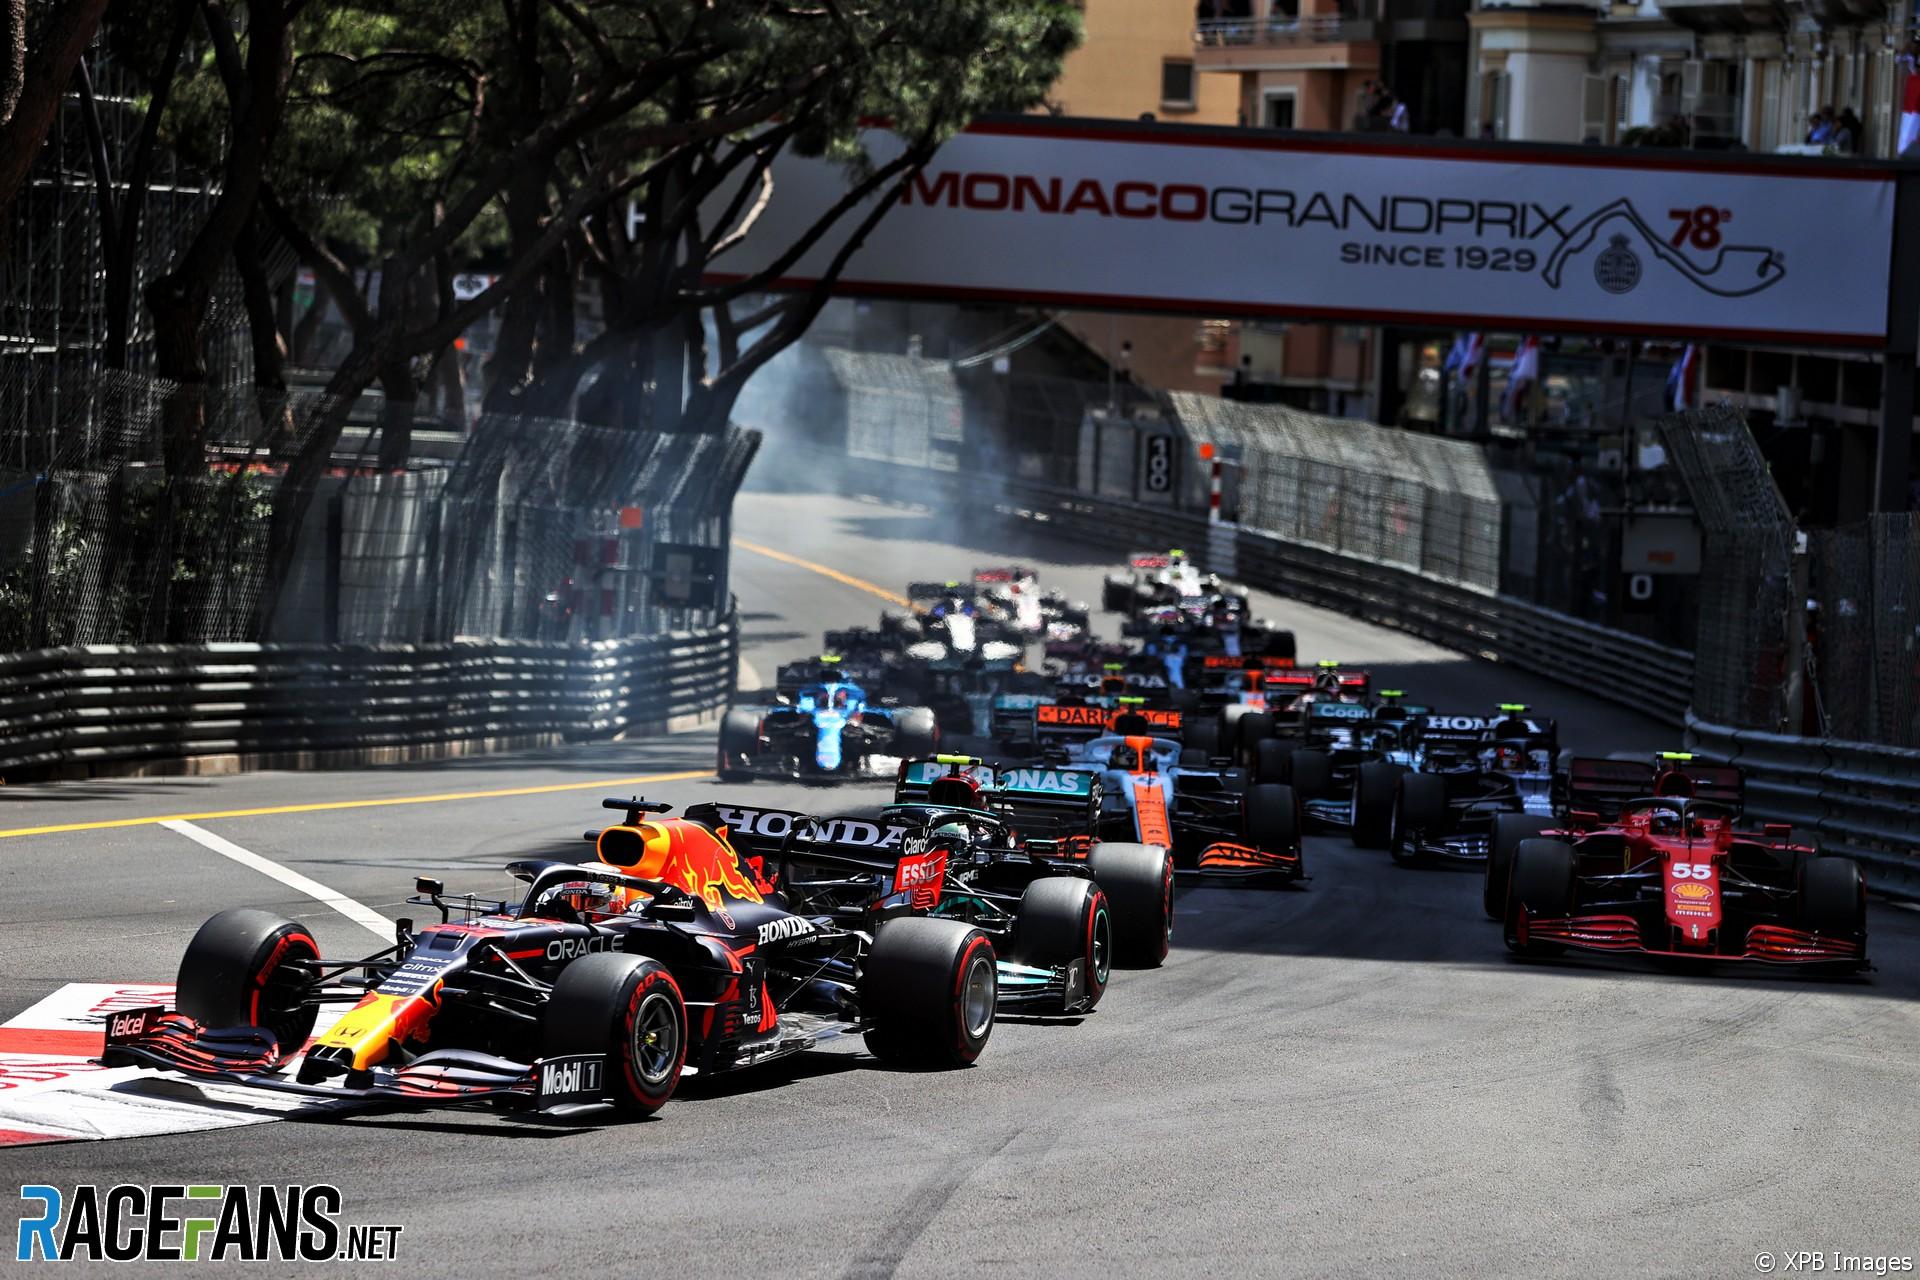 Start, Monaco, 2021